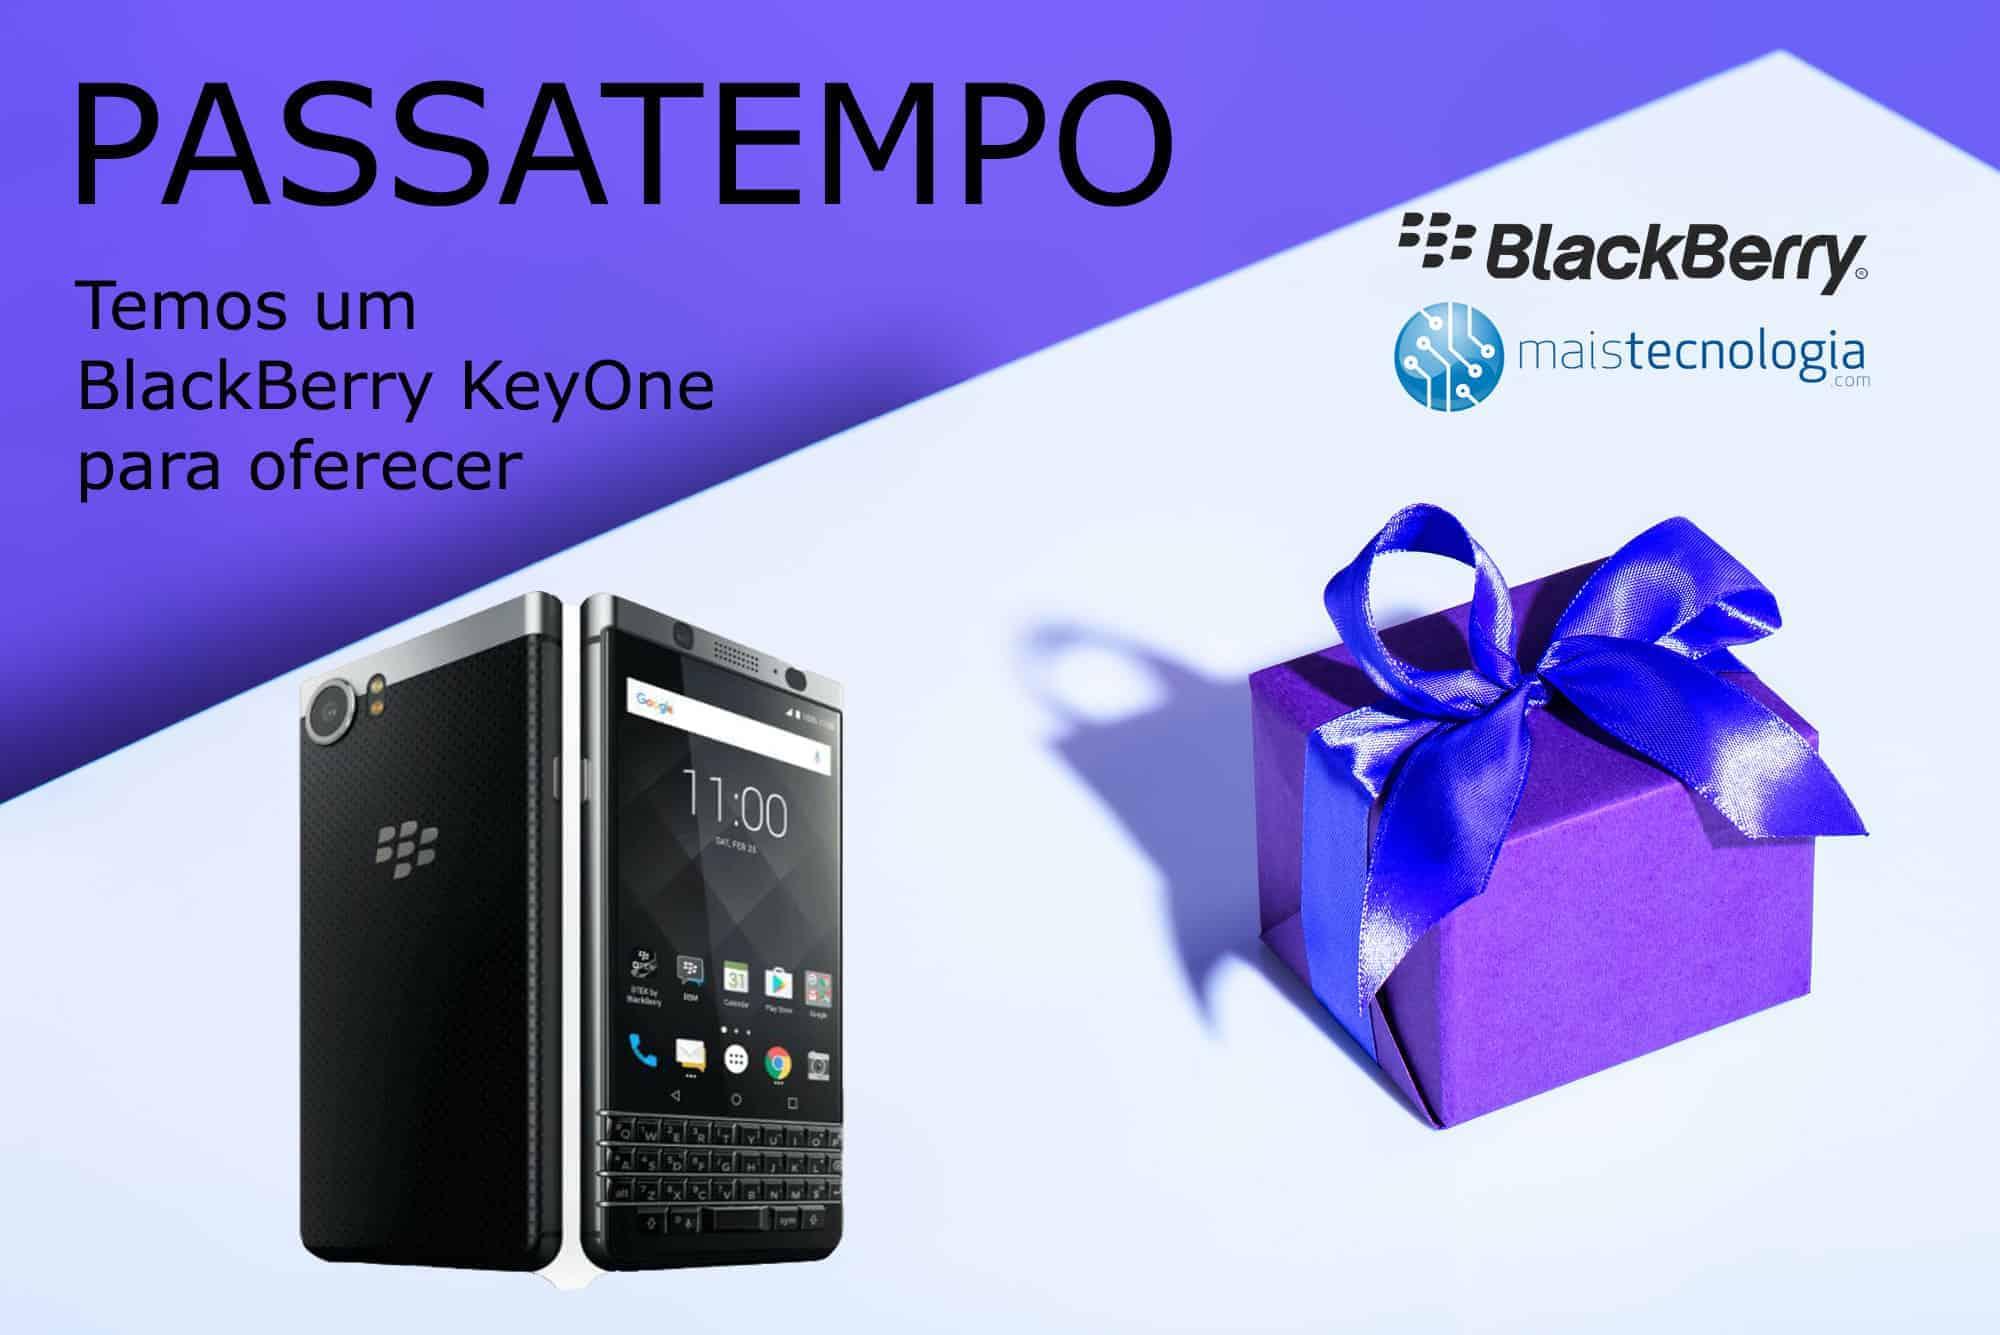 Passatempo smartphone BlackBerry KeyOne - 11/12 - MaisTecnologia Passatempo-BlackBerry-Keyone